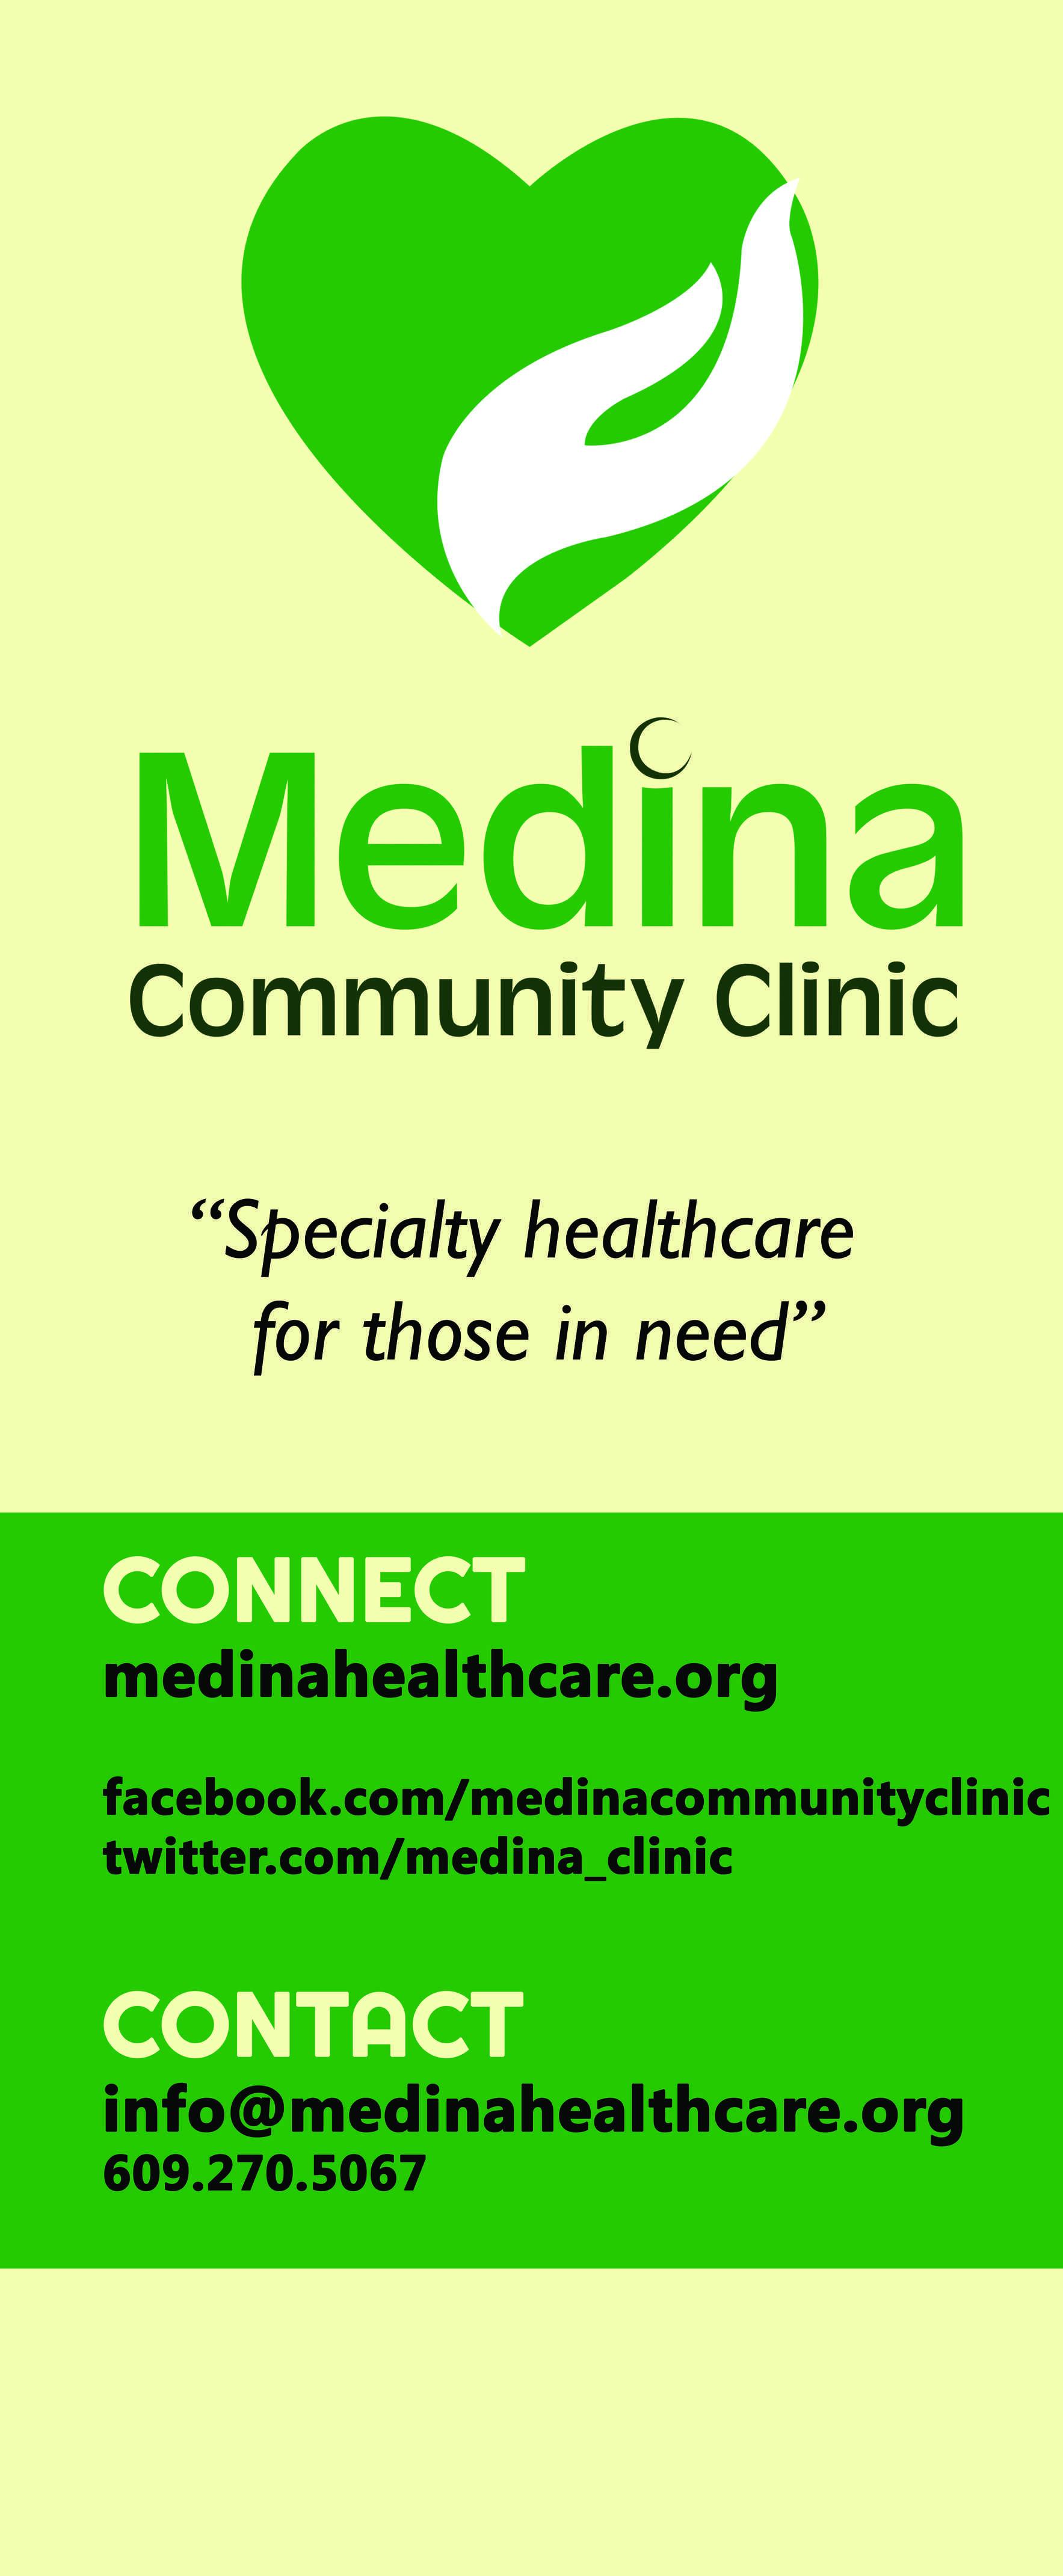 Donate to help Medina Community Clinic Today image